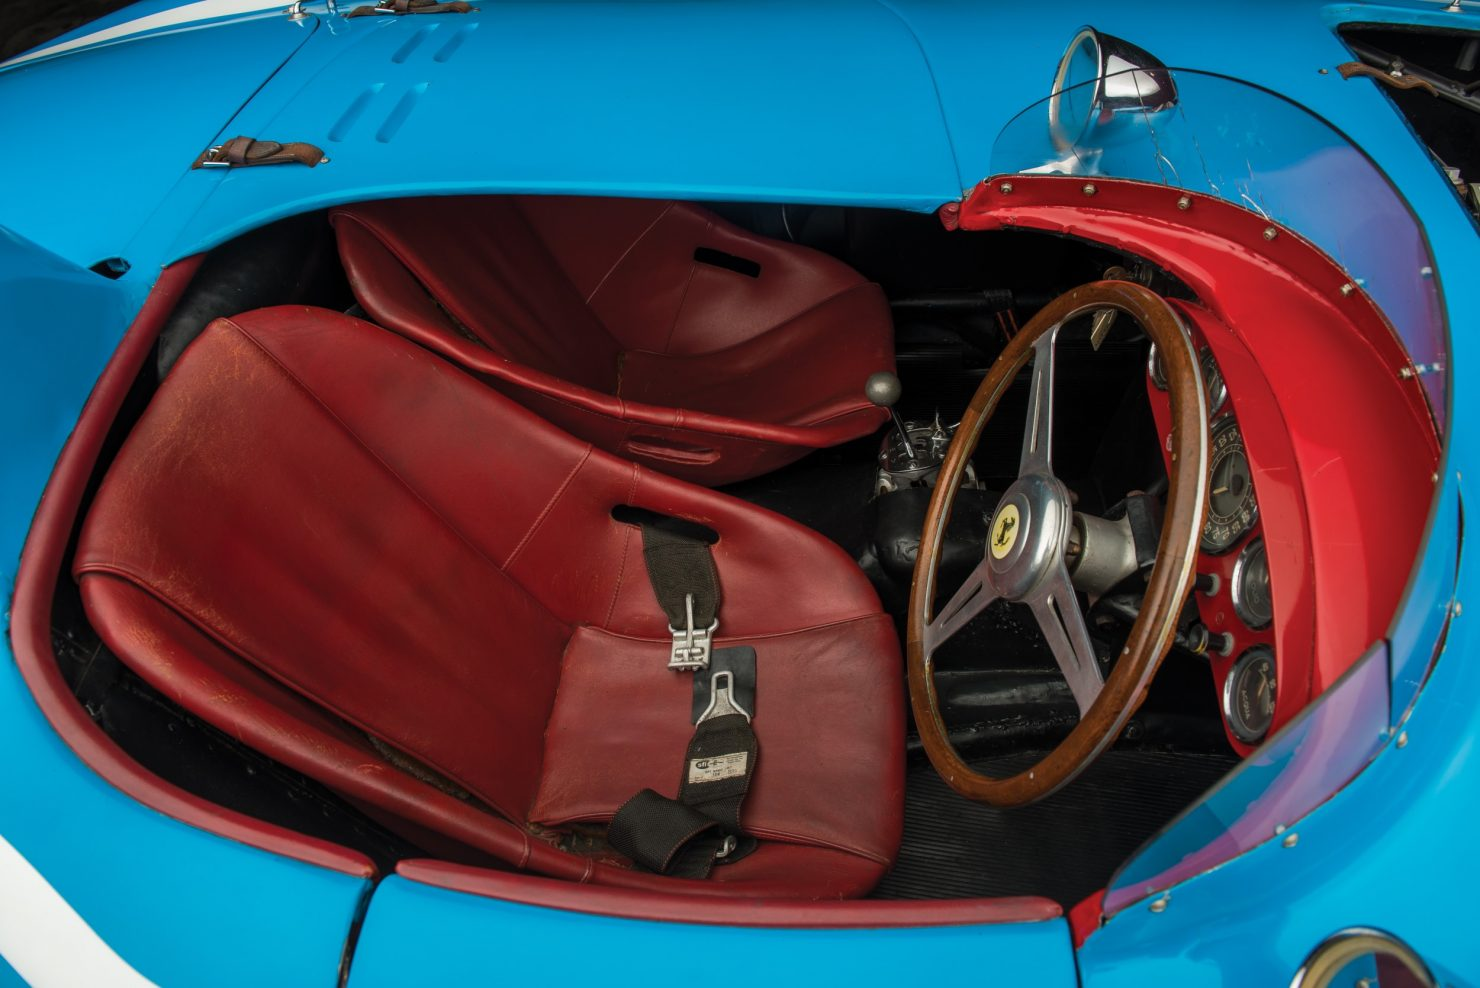 ferrari 121 lm spider 10 1480x988 - 1955 Ferrari 121 LM